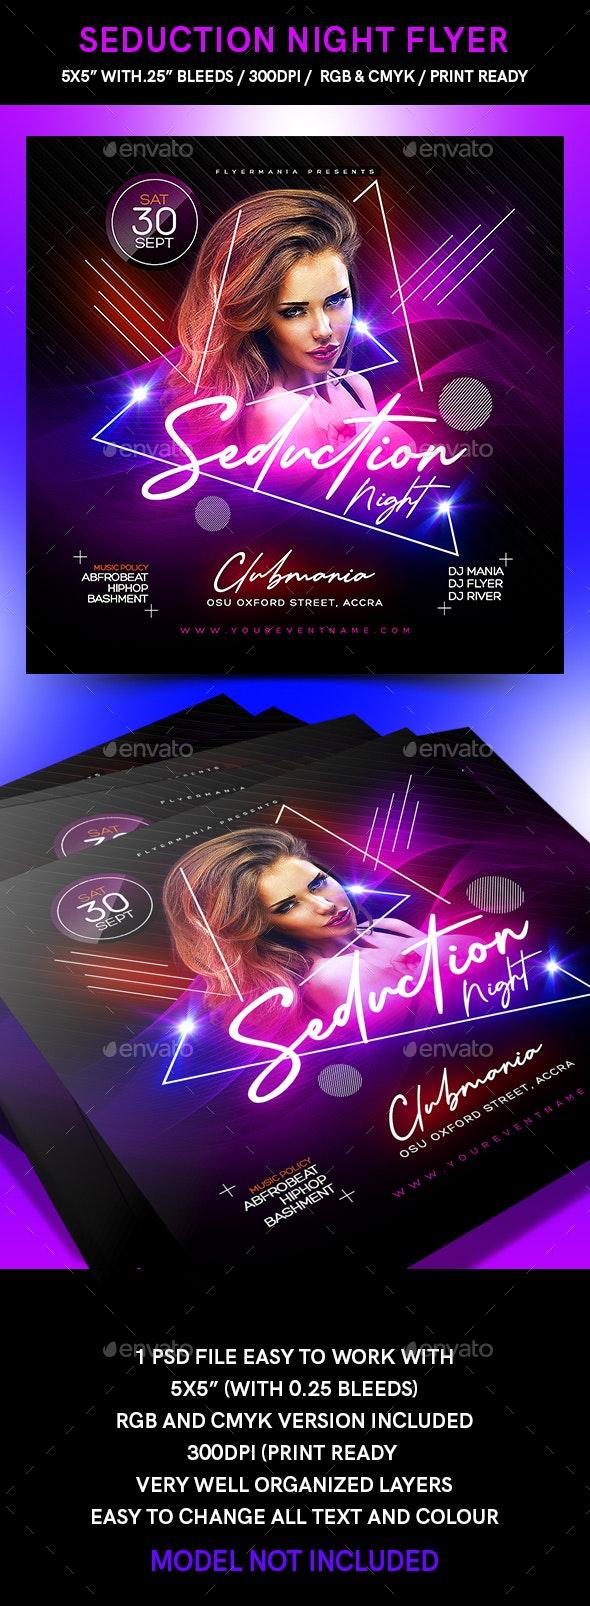 Seduction Night Flyer - Flyers Print Templates